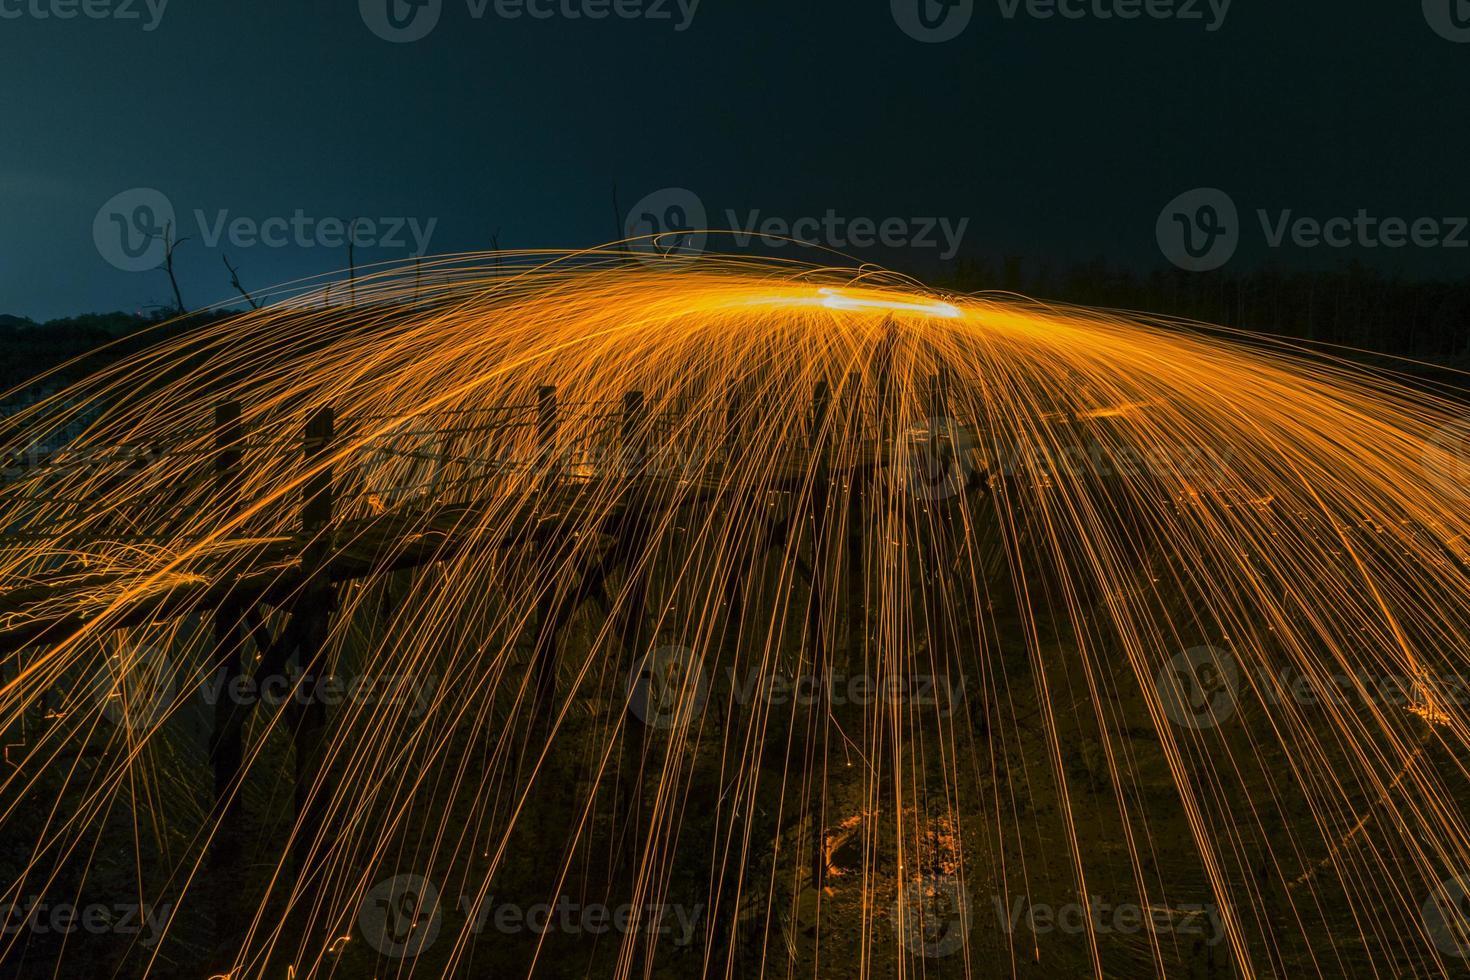 vuurwerkdouches van hete gloeiende vonken van draaiende staalwol. foto